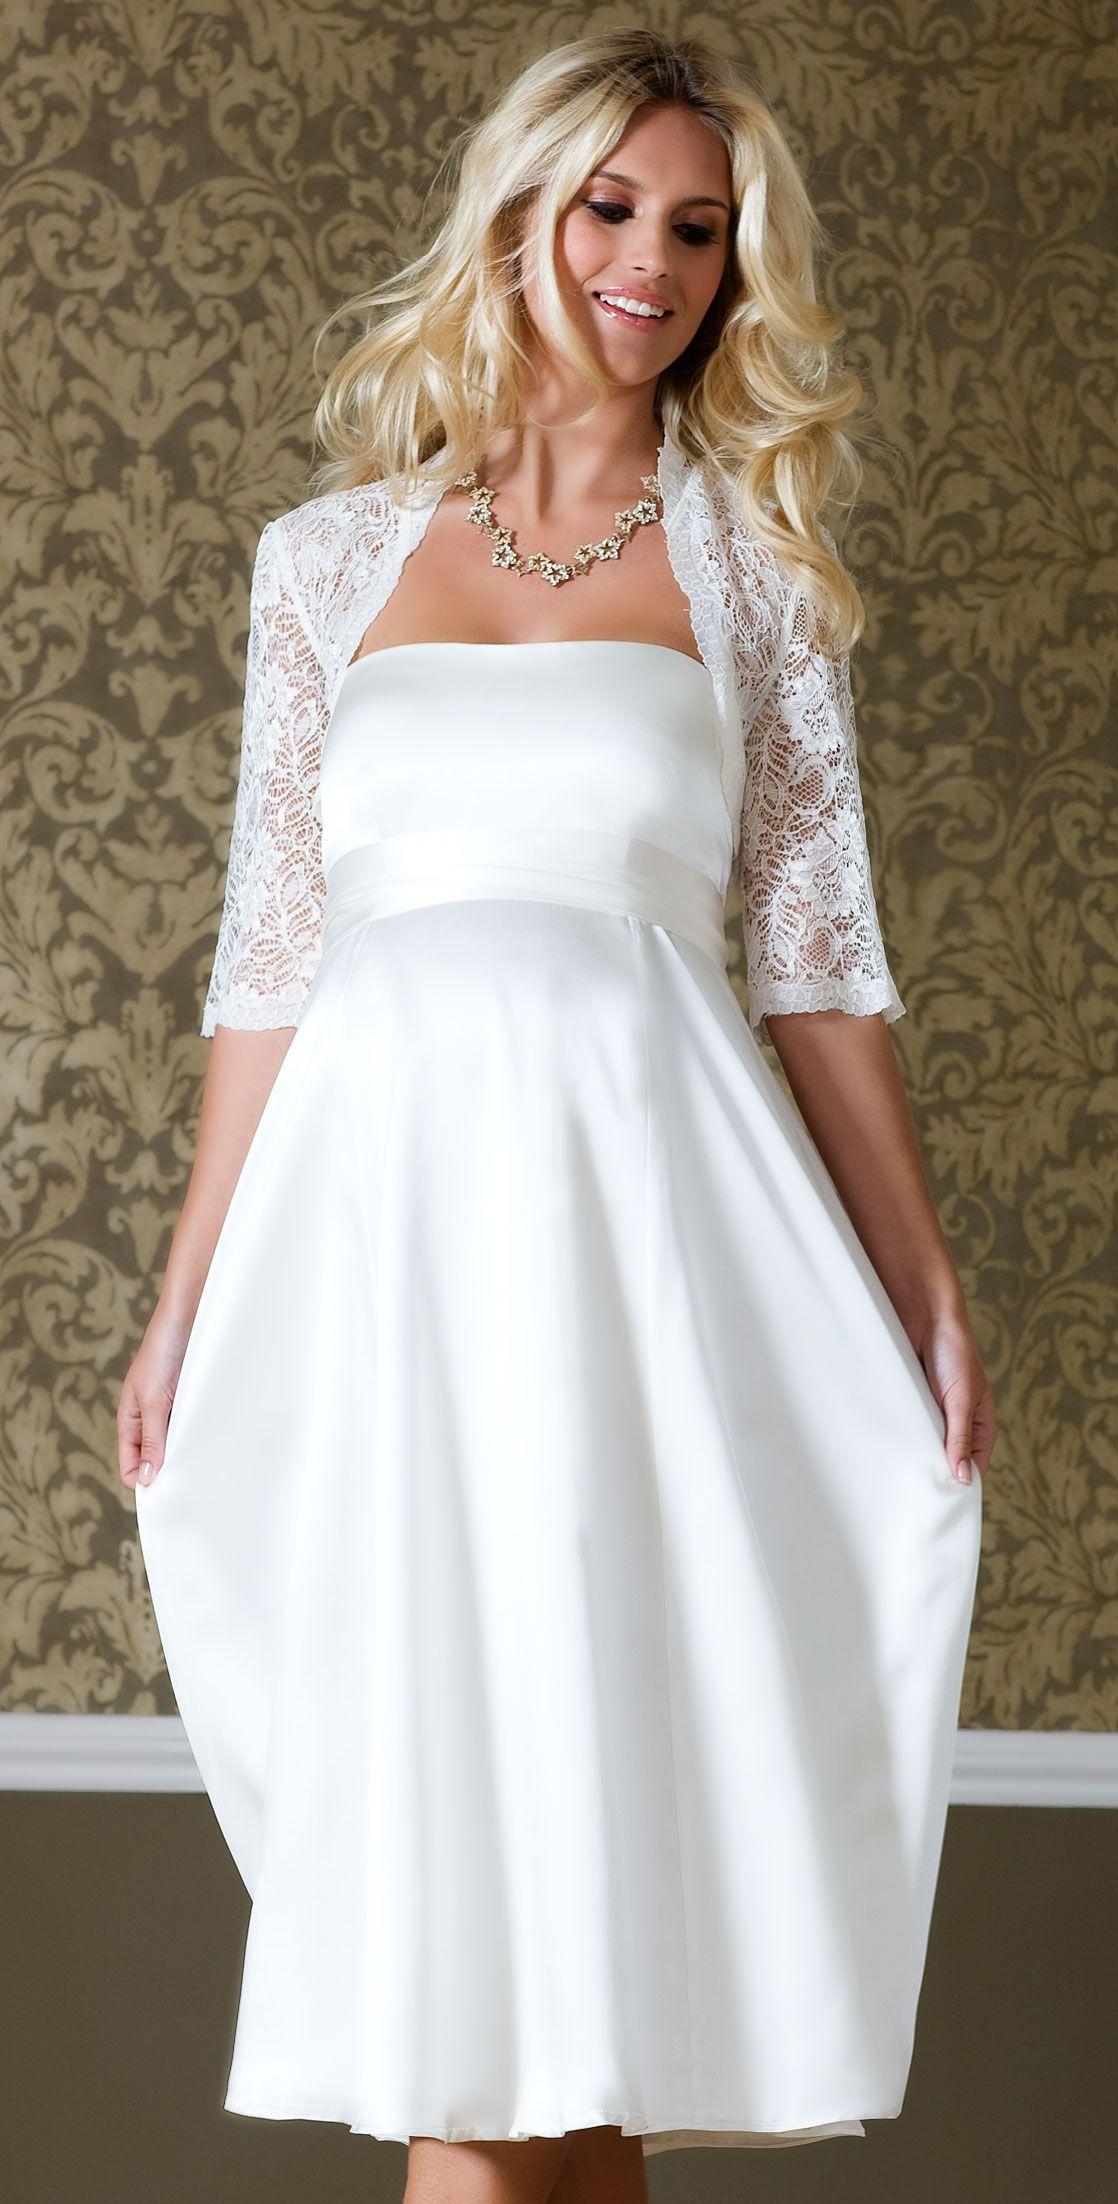 Extraordinary maternity wedding dresses plus size | Maternity Plus ...